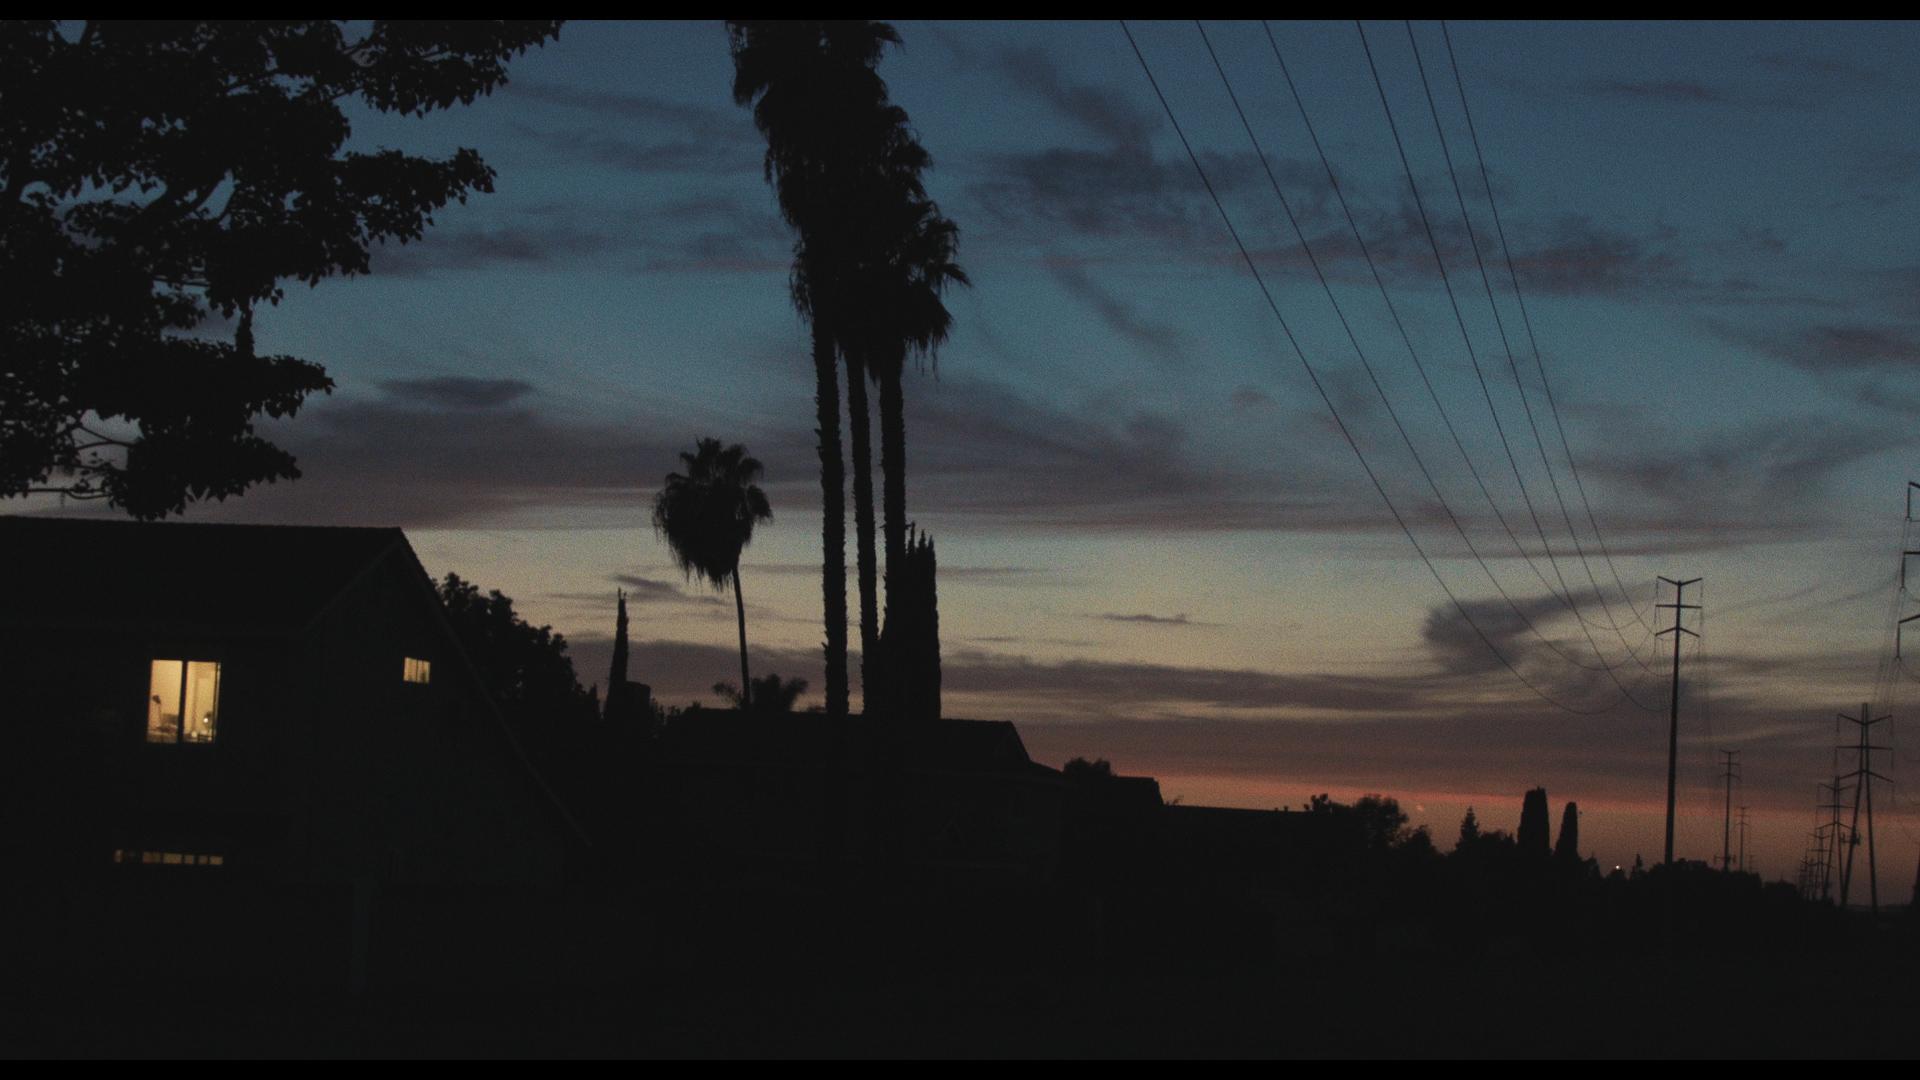 Three Worlds - Suburbs of California